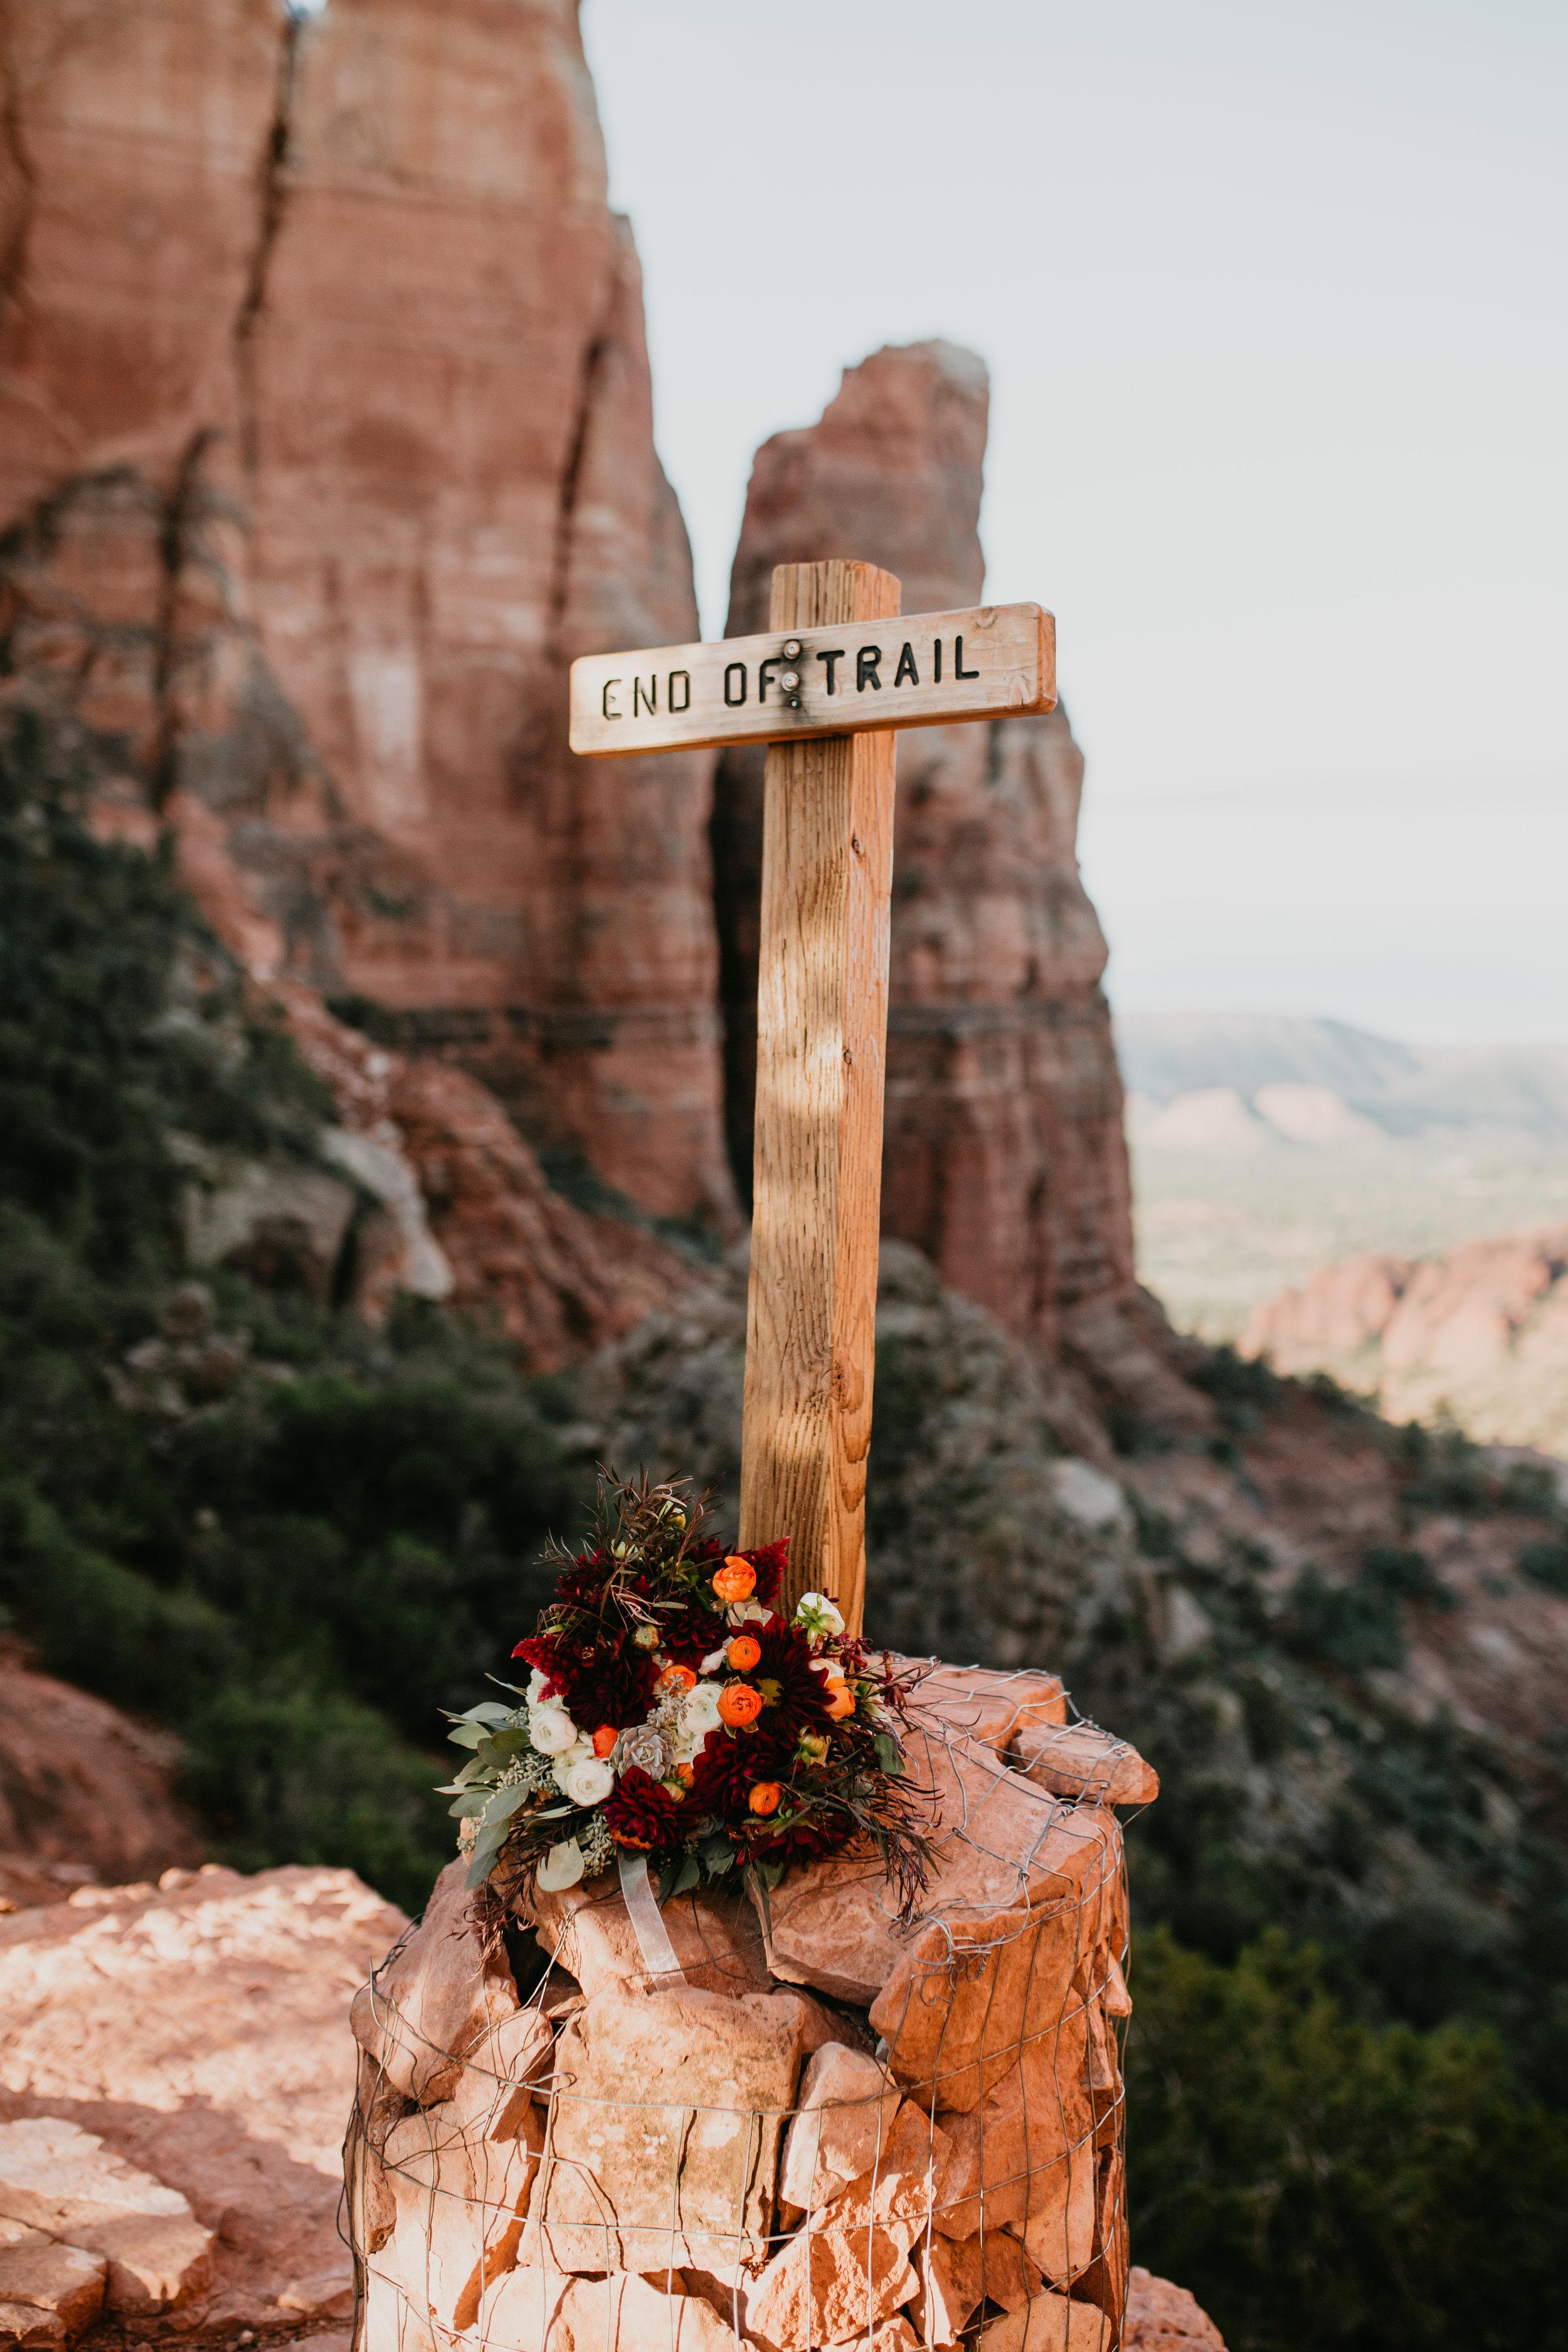 nicole-daacke-photography-sedona-arizona-destination-elopement-wedding-photographer-catherdral-rock-hiking-elopement-sedona-river-elopement-photos-desert-rock-wedding-photographer-laid-back-spontaneous-elopement-62.jpg